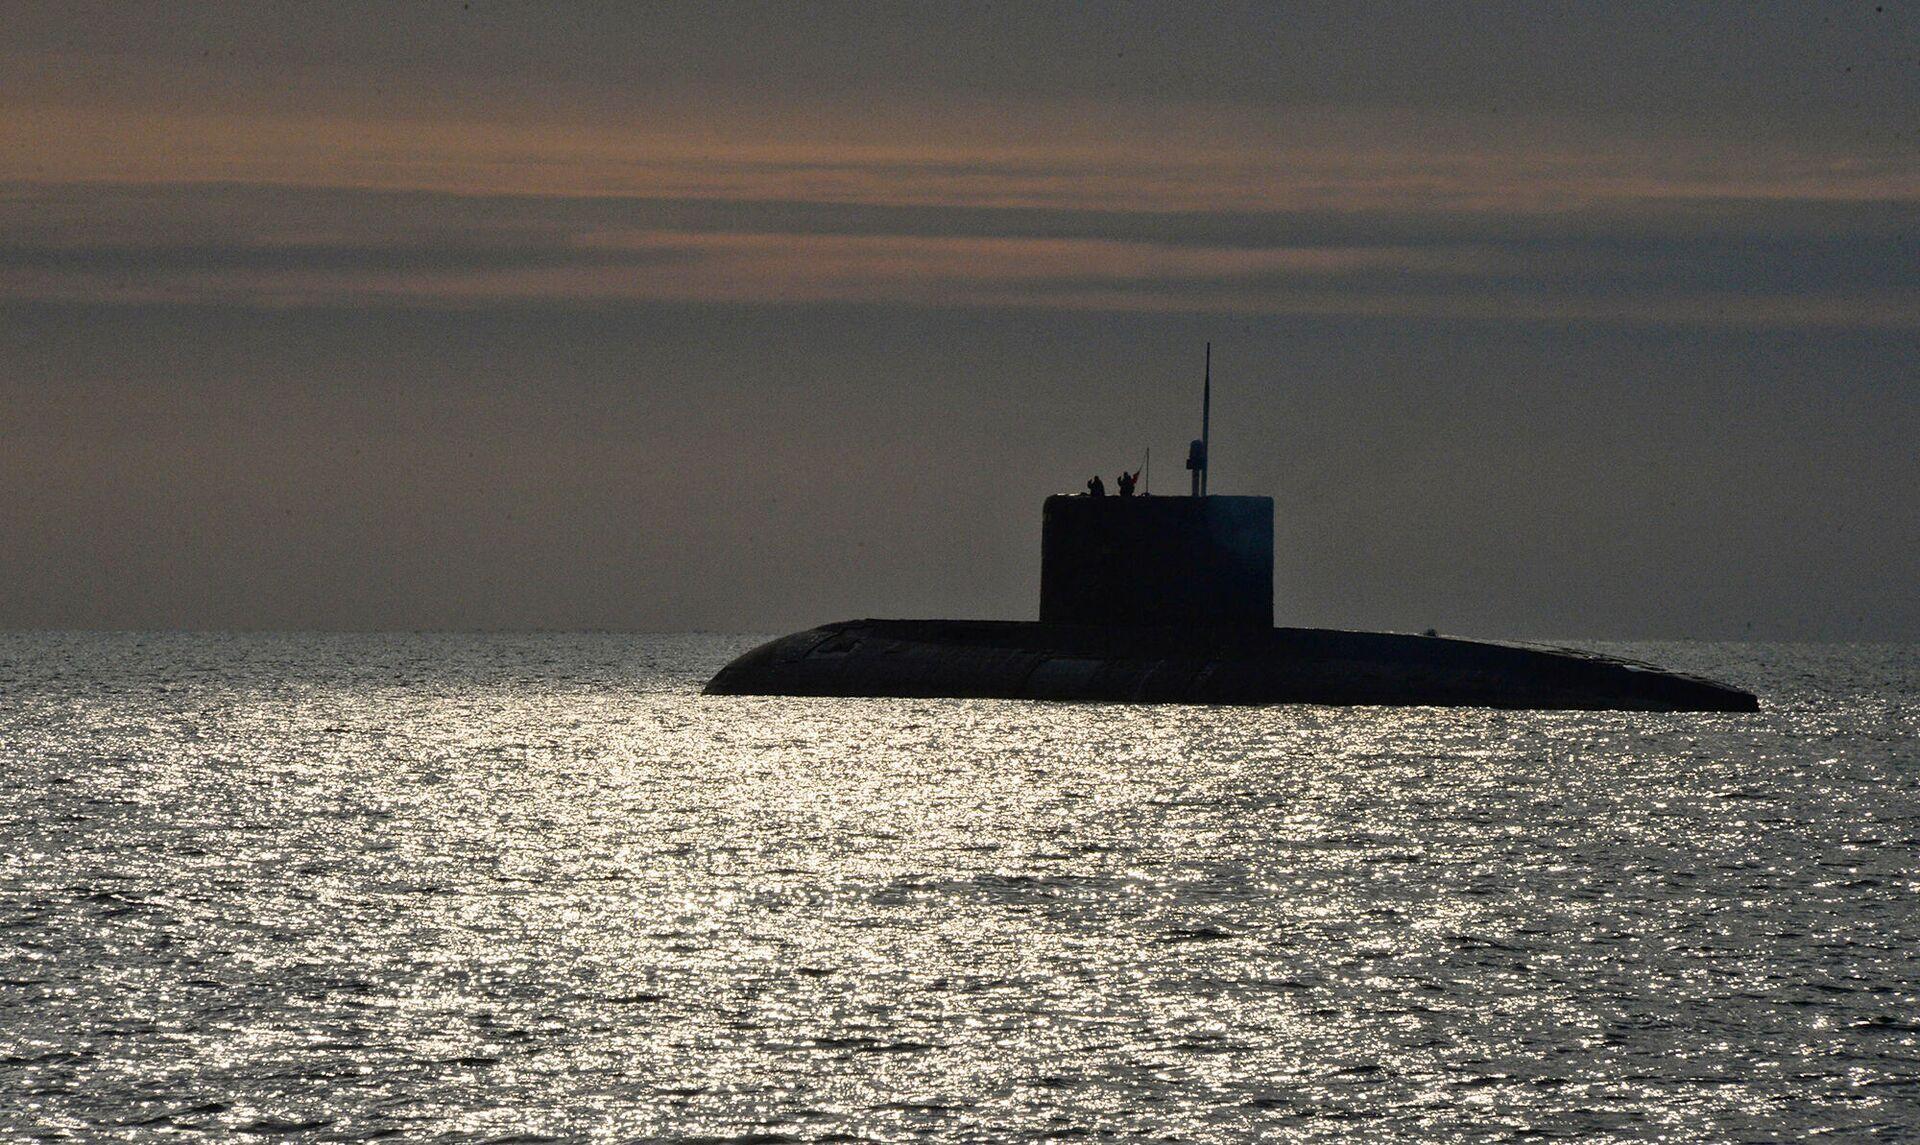 Подводная лодка класса Варшавянка - РИА Новости, 1920, 18.06.2021